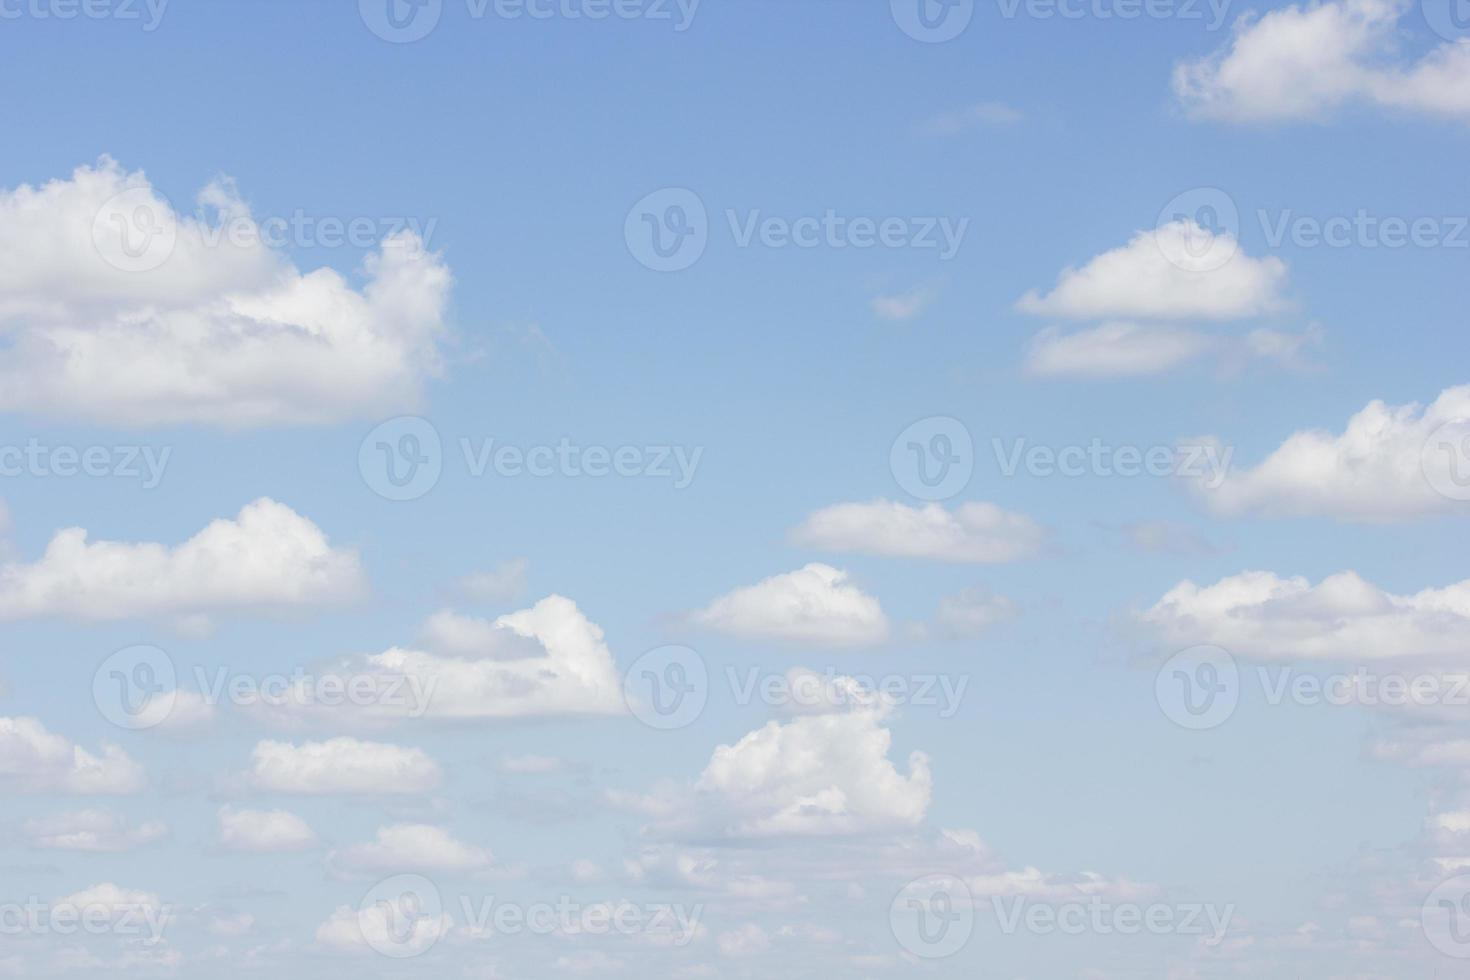 cielo blu con nuvole closeup foto